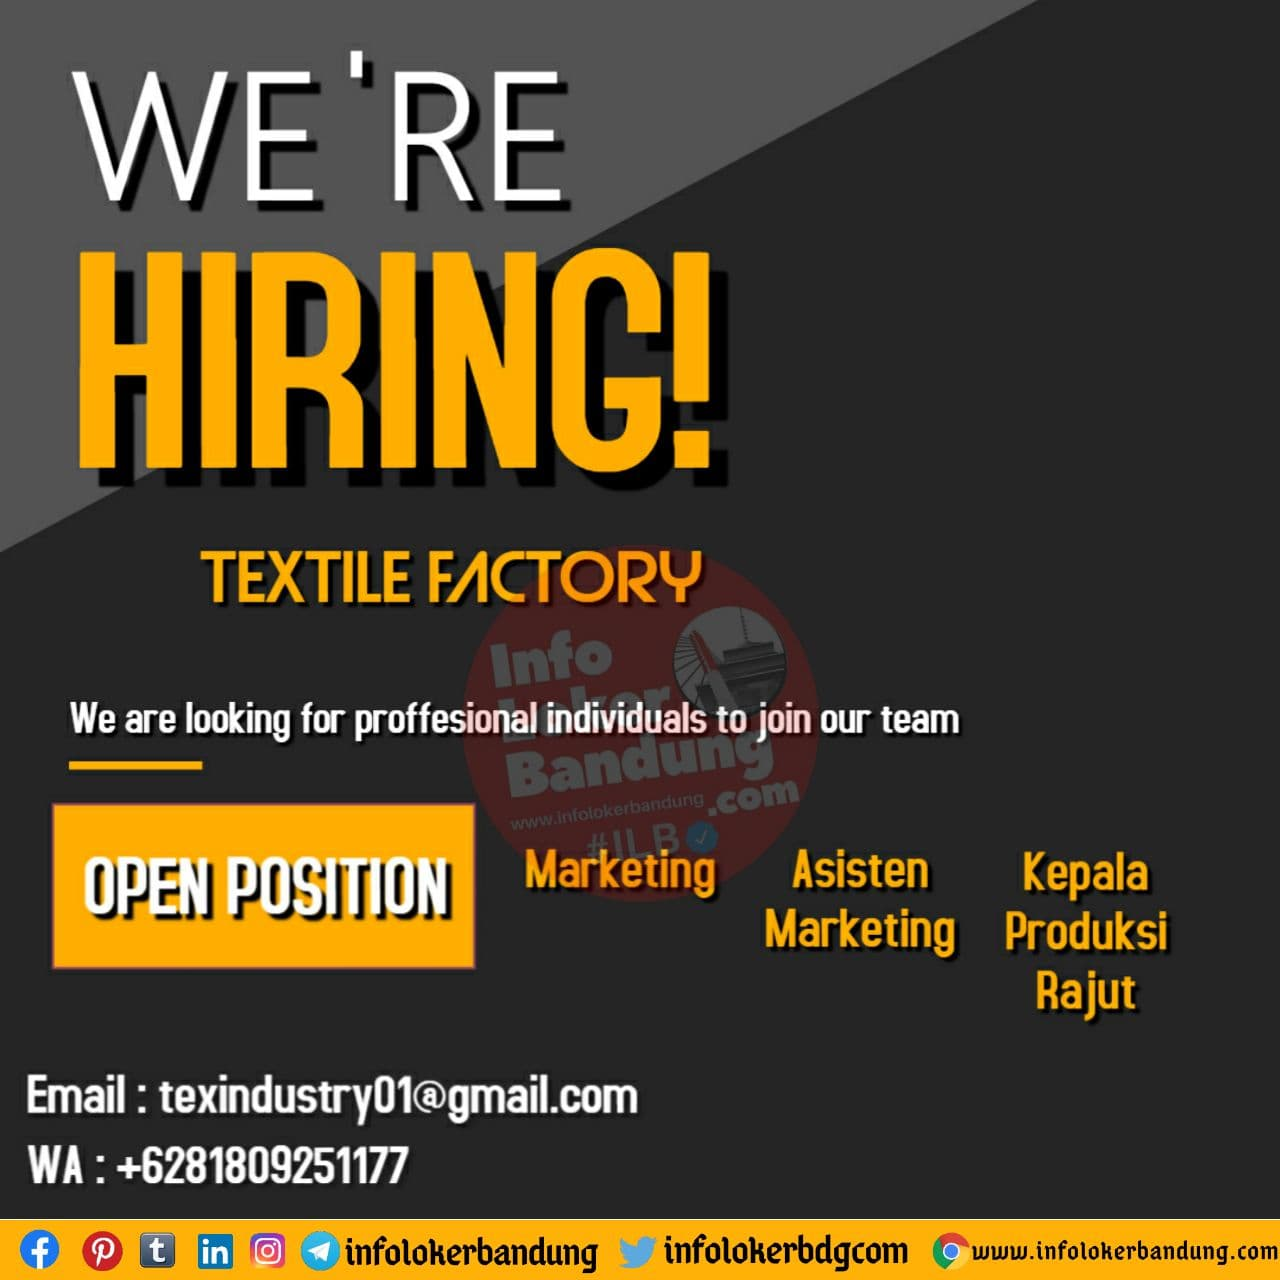 Lowongan Kerja Textile Factory Bandung November 2020